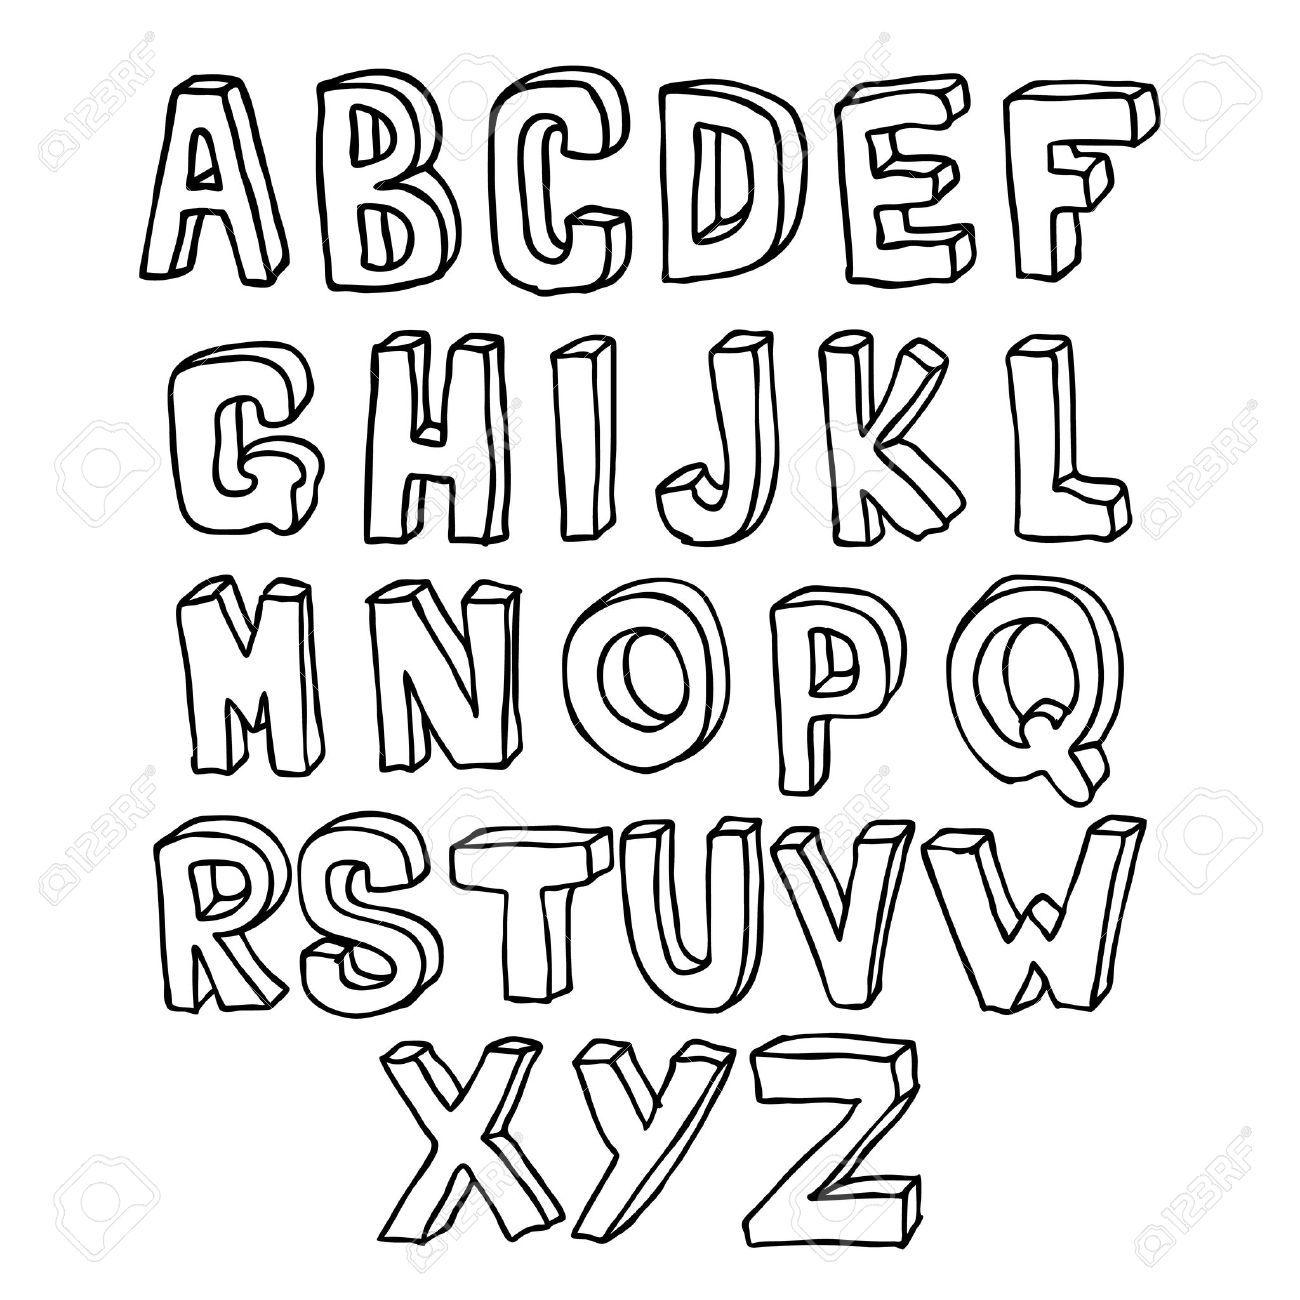 Hand drawn Lettering 3D | Hand Lettering | Pinterest | 3d ...